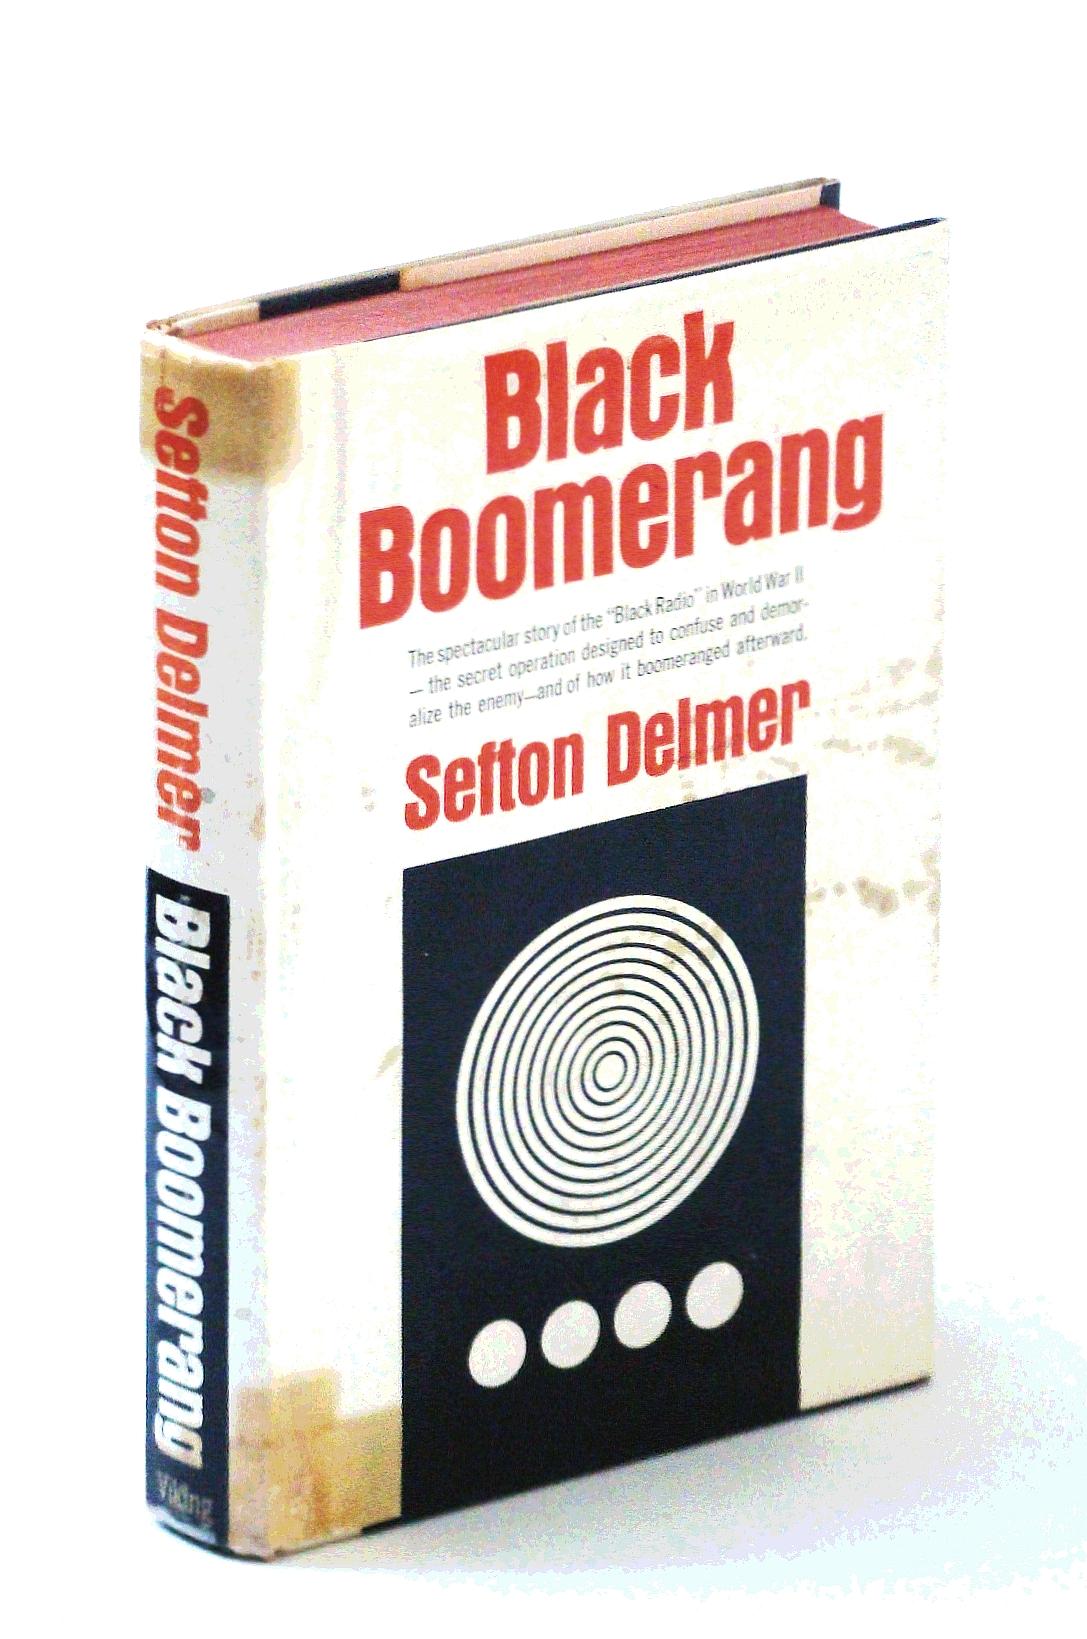 Black boomerang